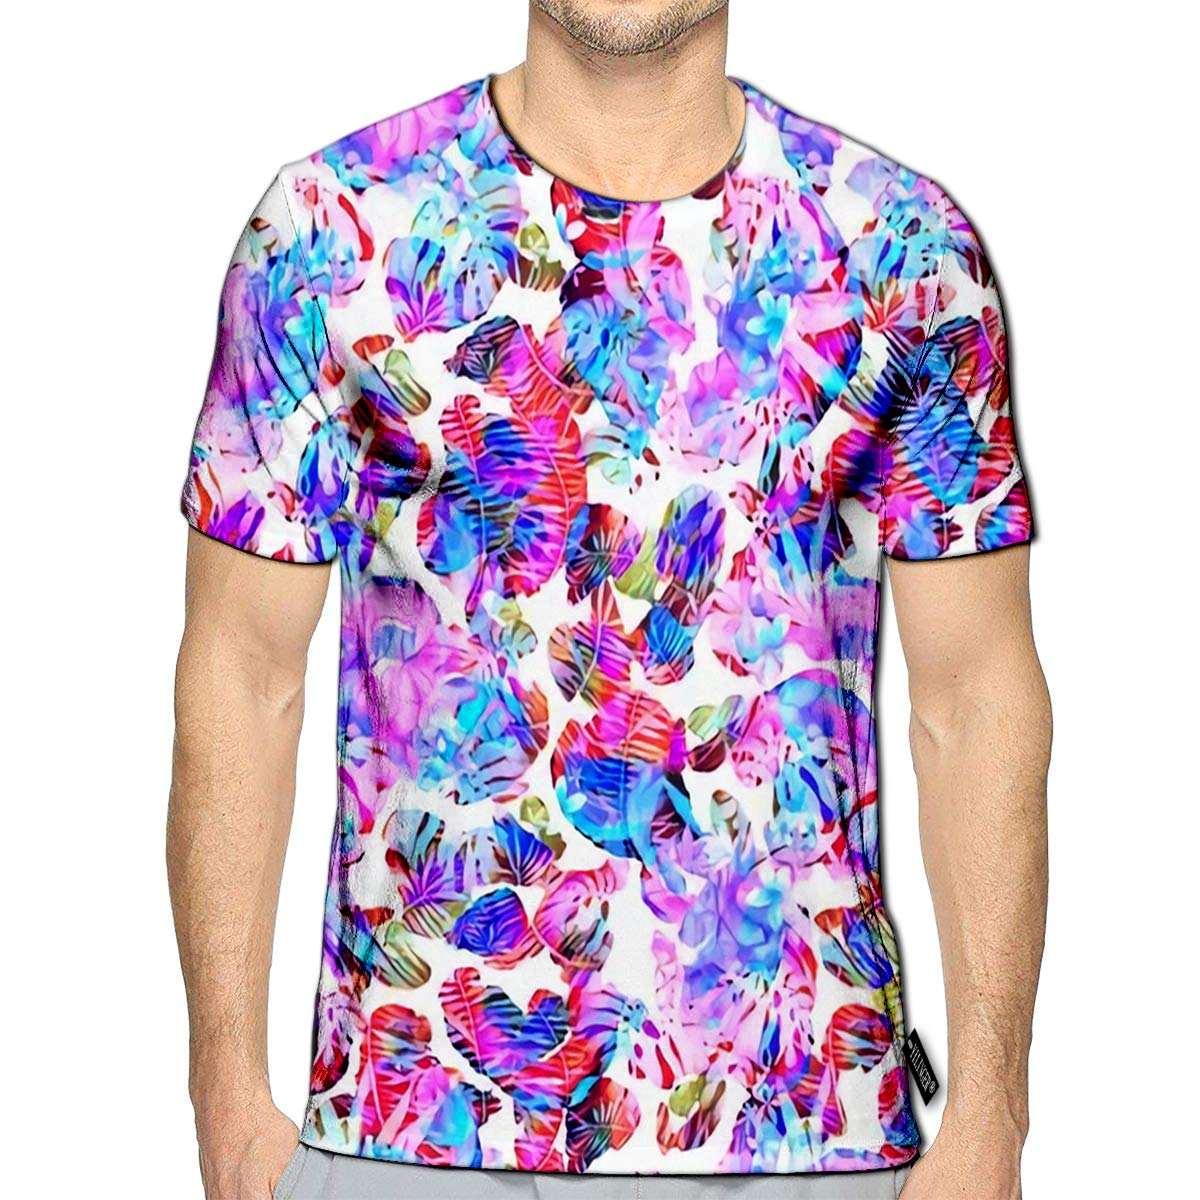 YILINGER 3D Printed T-Shirts Decorative Bananas Wild Leopard Coloring Dangerous Short Sleeve Tops Tees